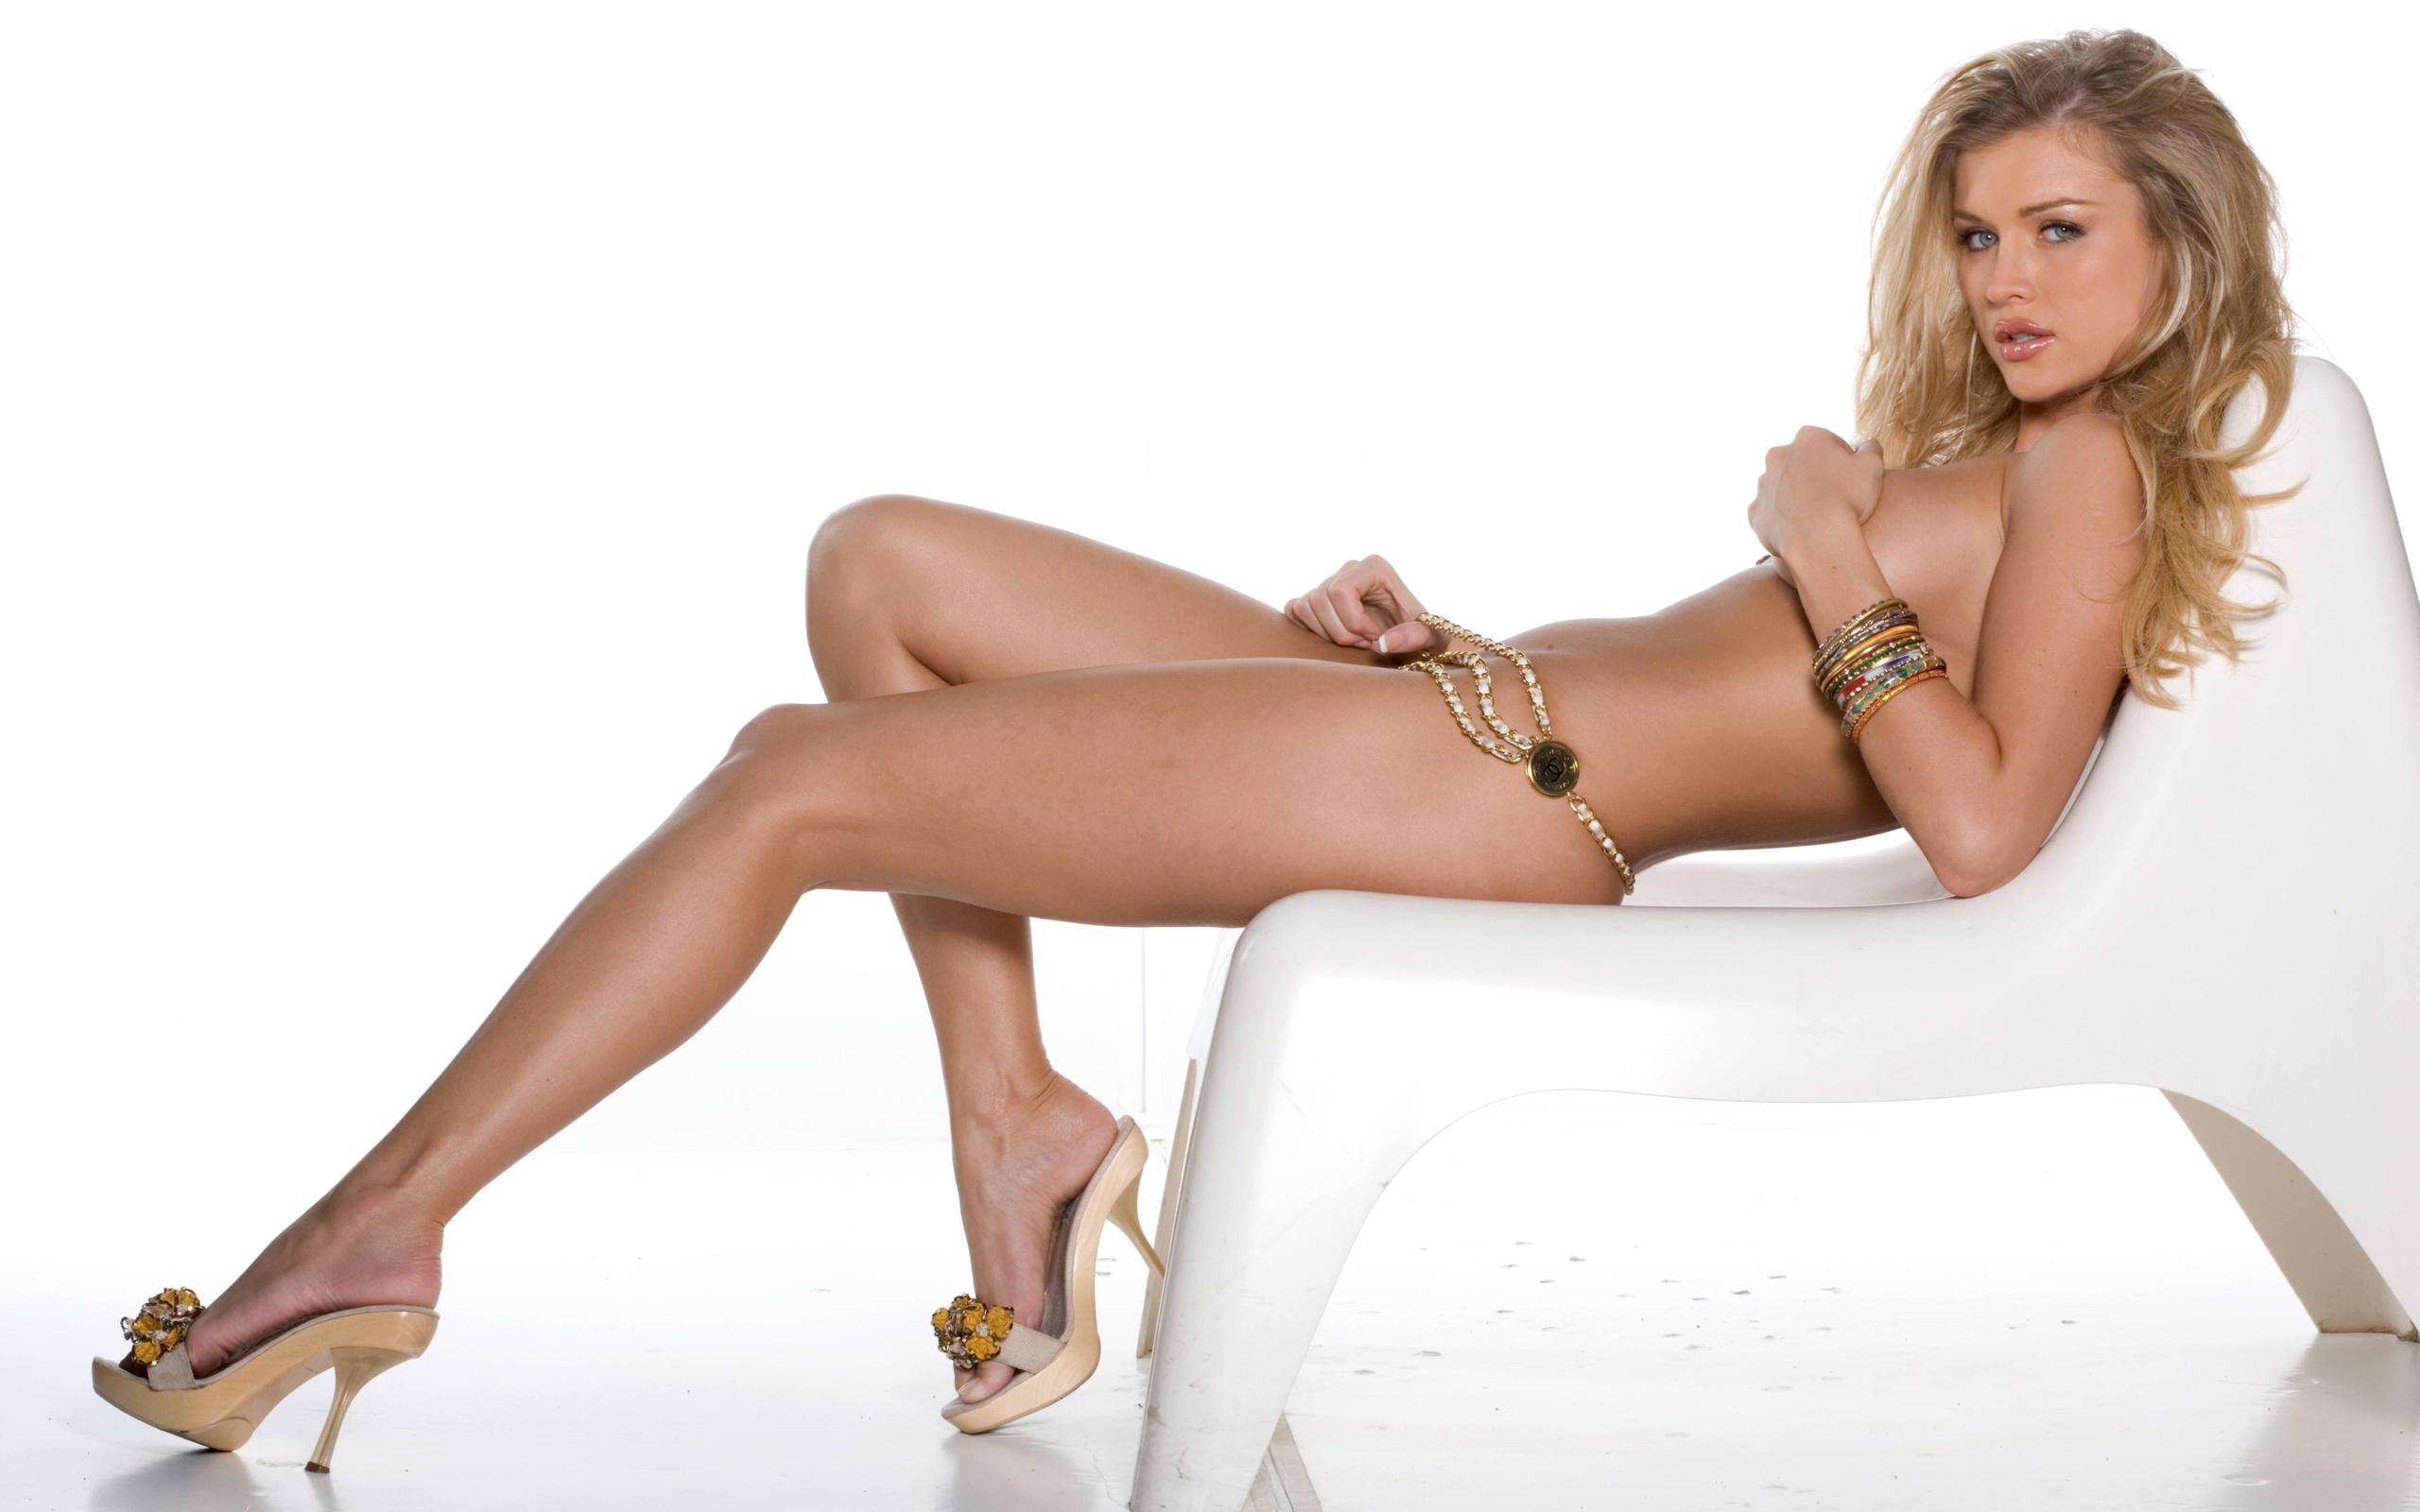 world-most-sexiest-women-nude